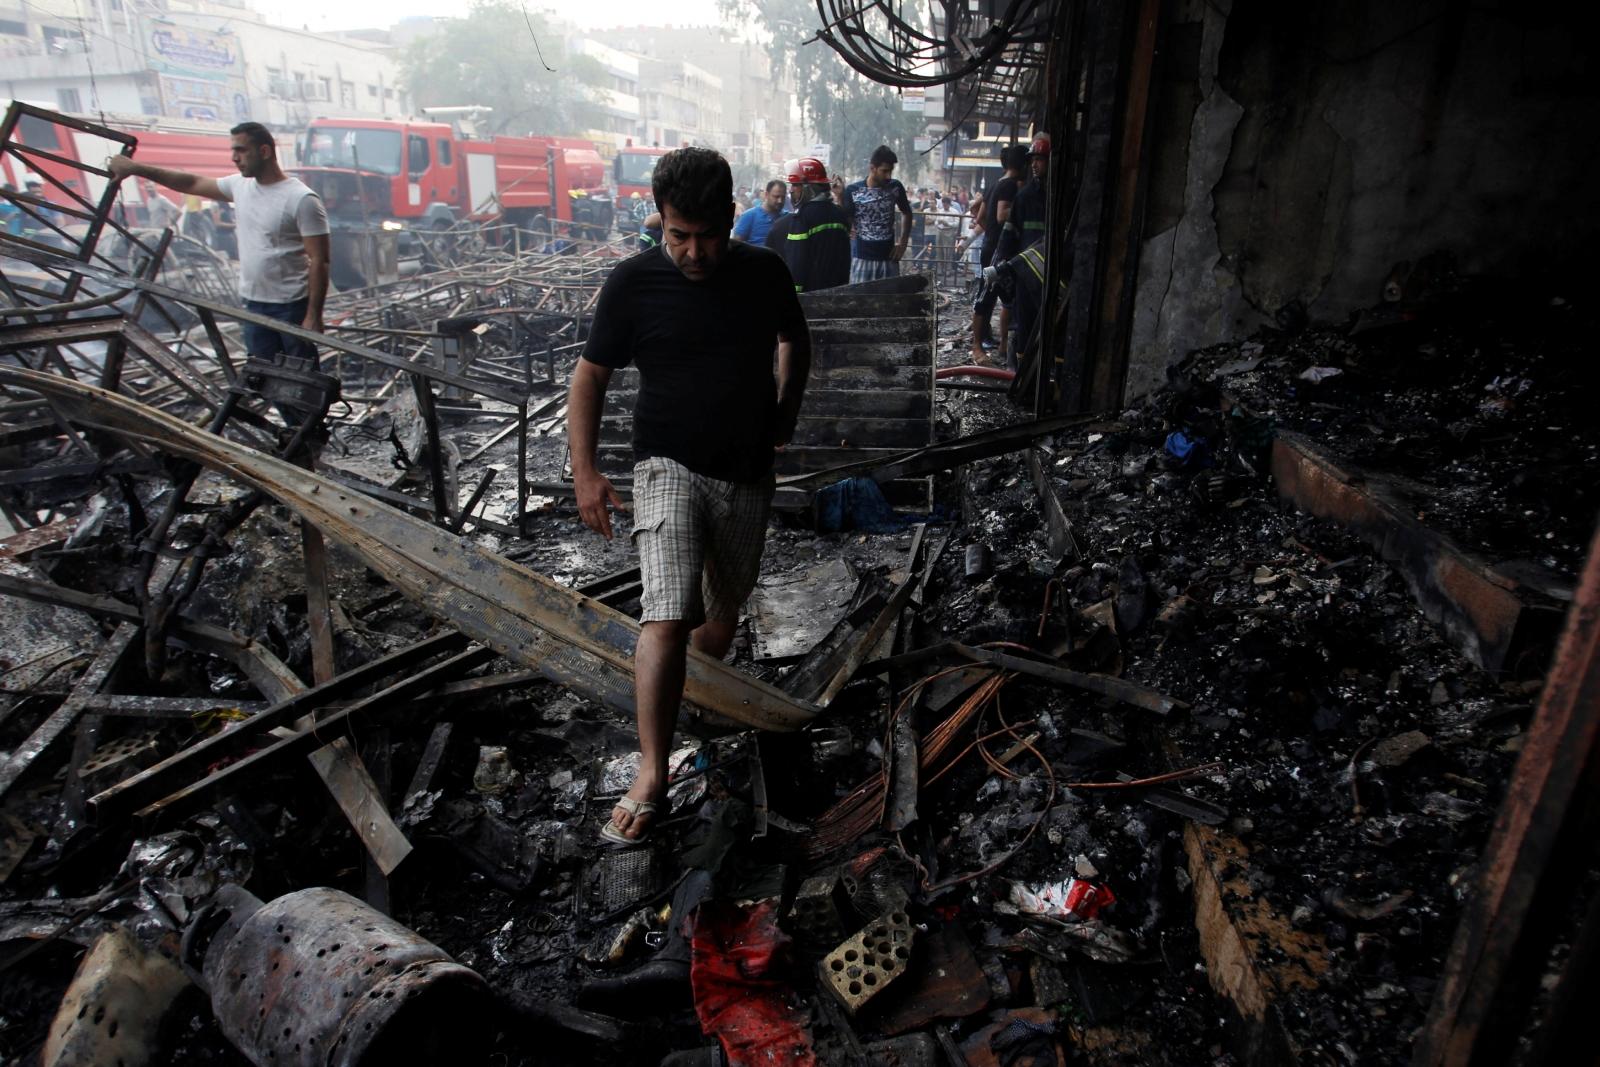 Baghdad bombing 3 July 2016